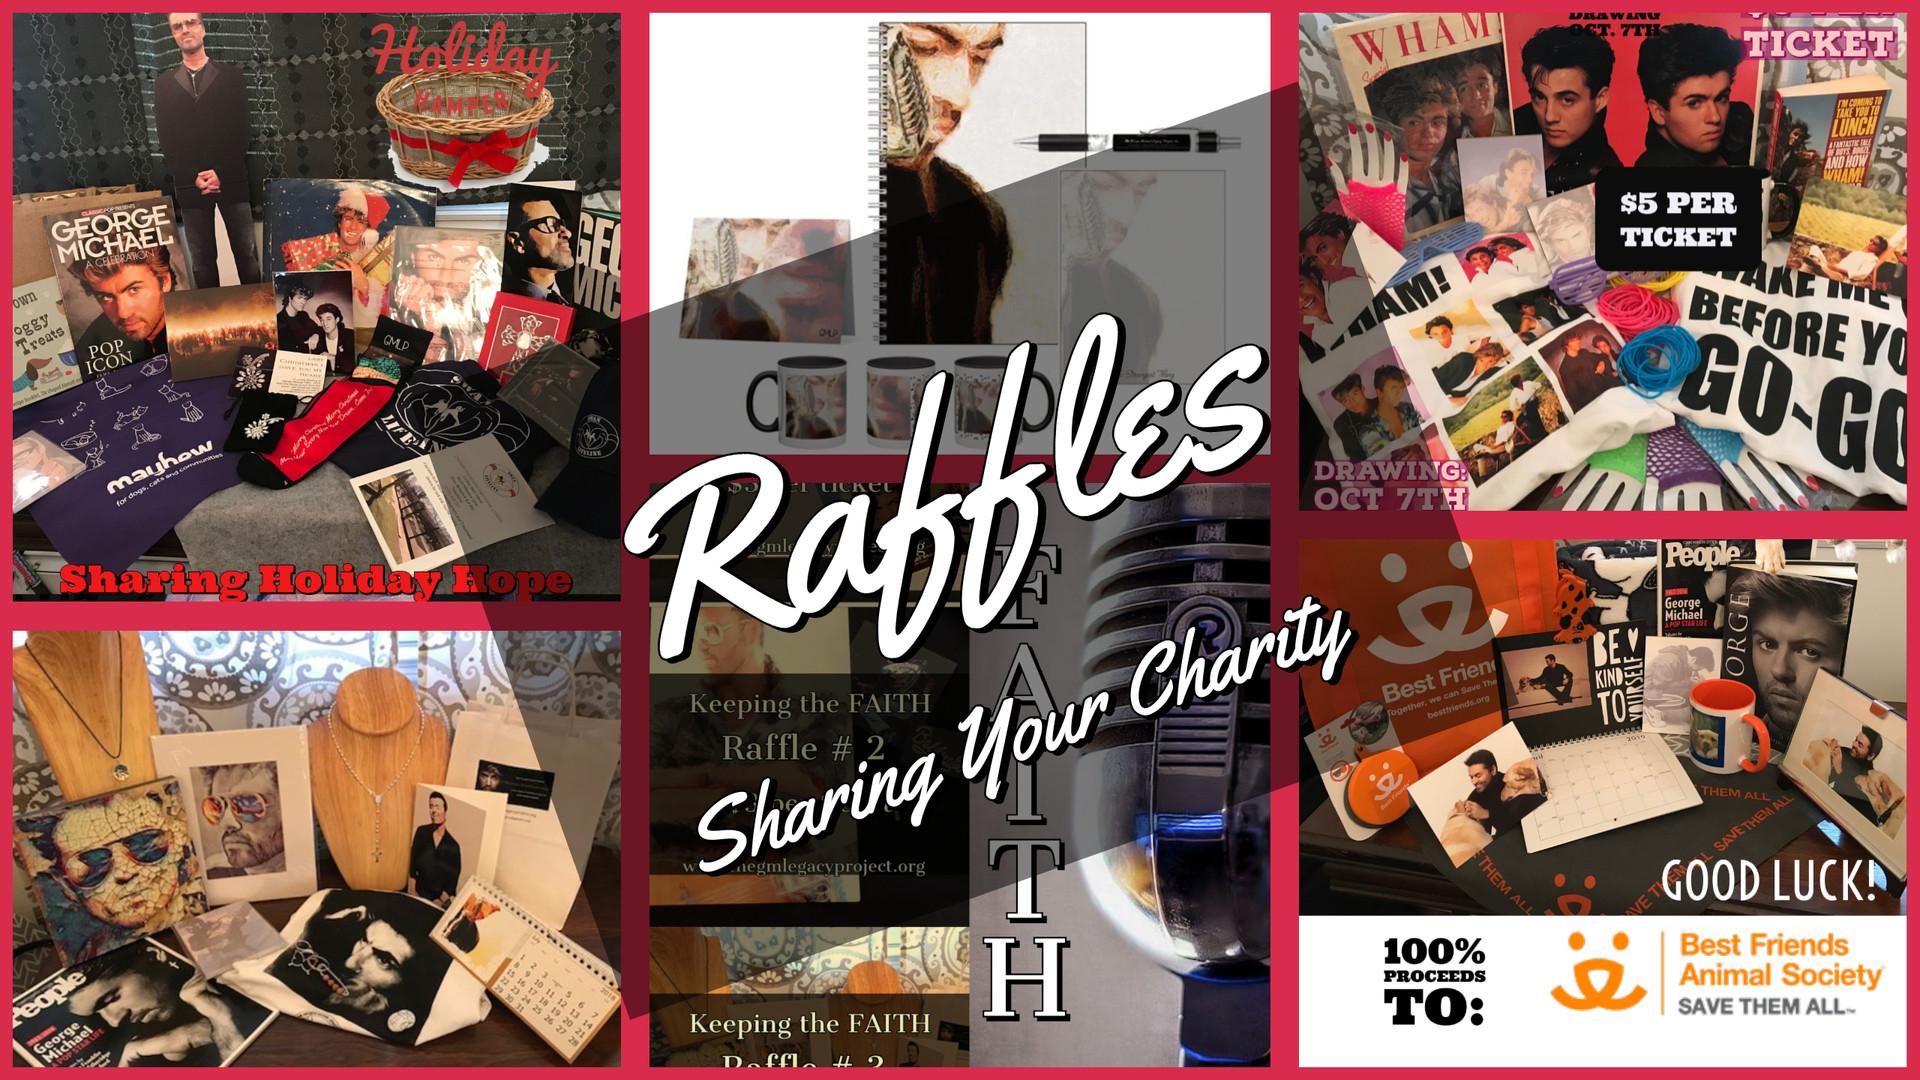 GMLP Raffle for Charity